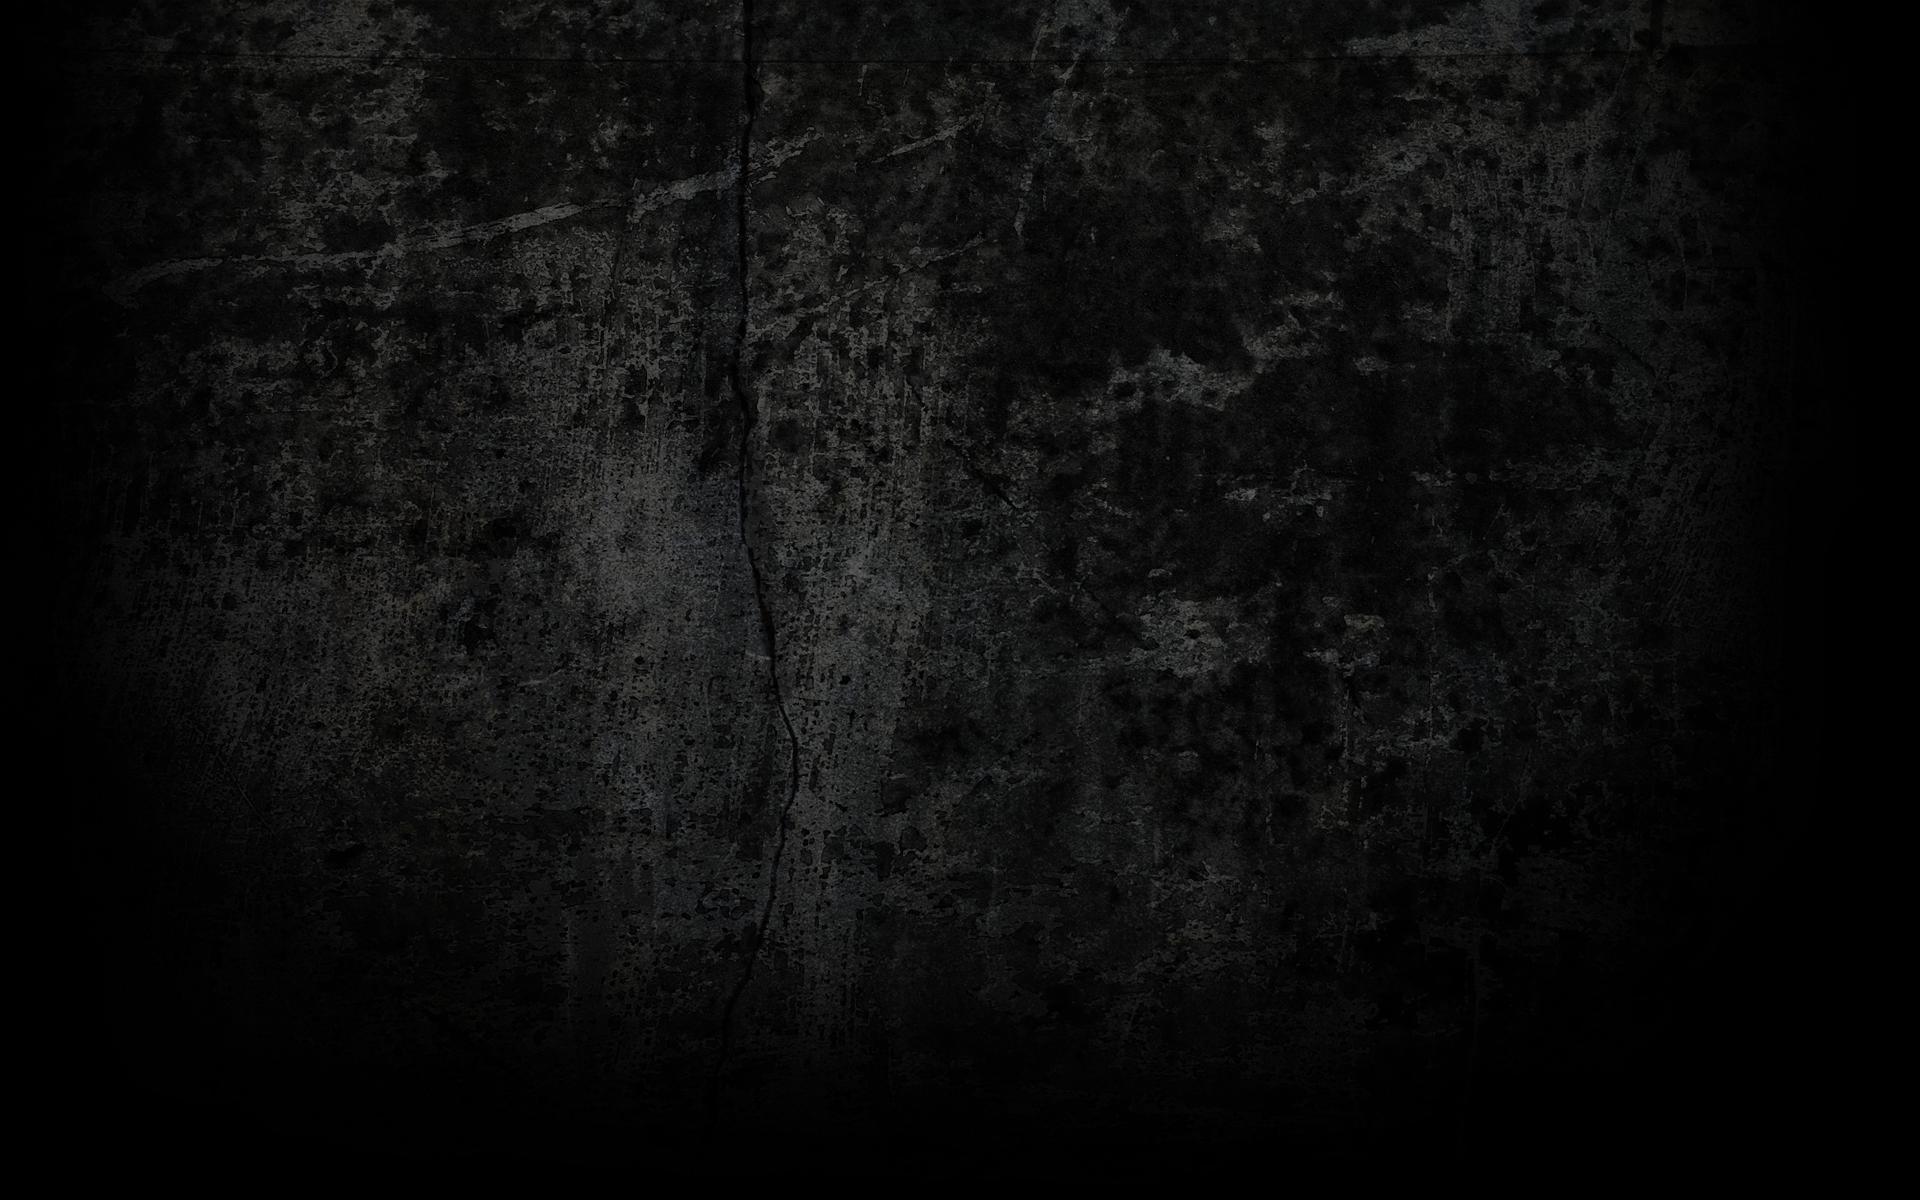 Grunge Wallpapers 1920x1200